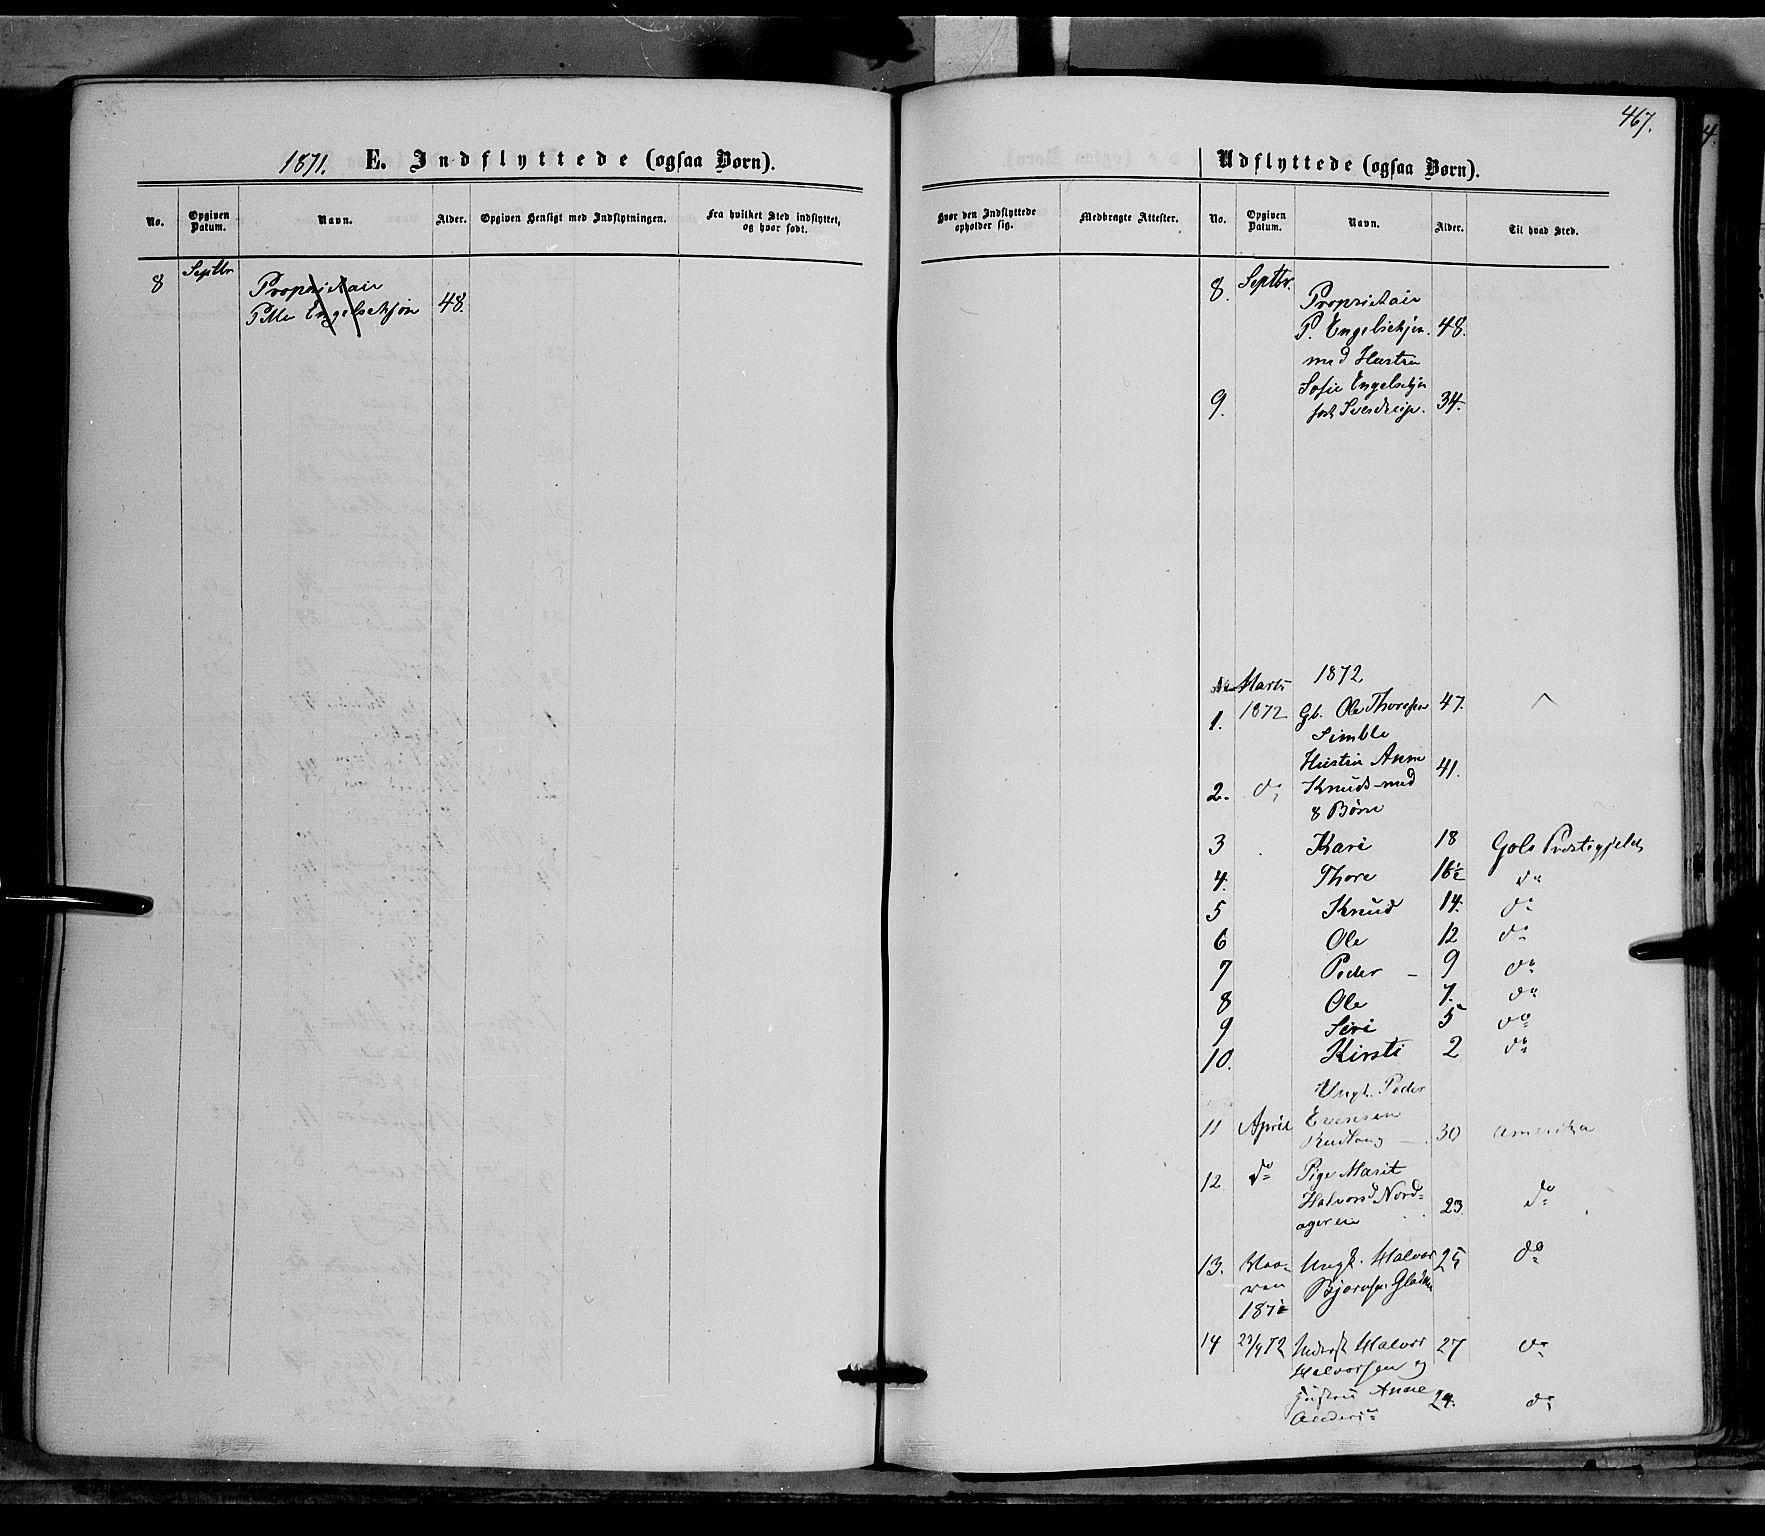 SAH, Nord-Aurdal prestekontor, Ministerialbok nr. 8, 1863-1875, s. 467